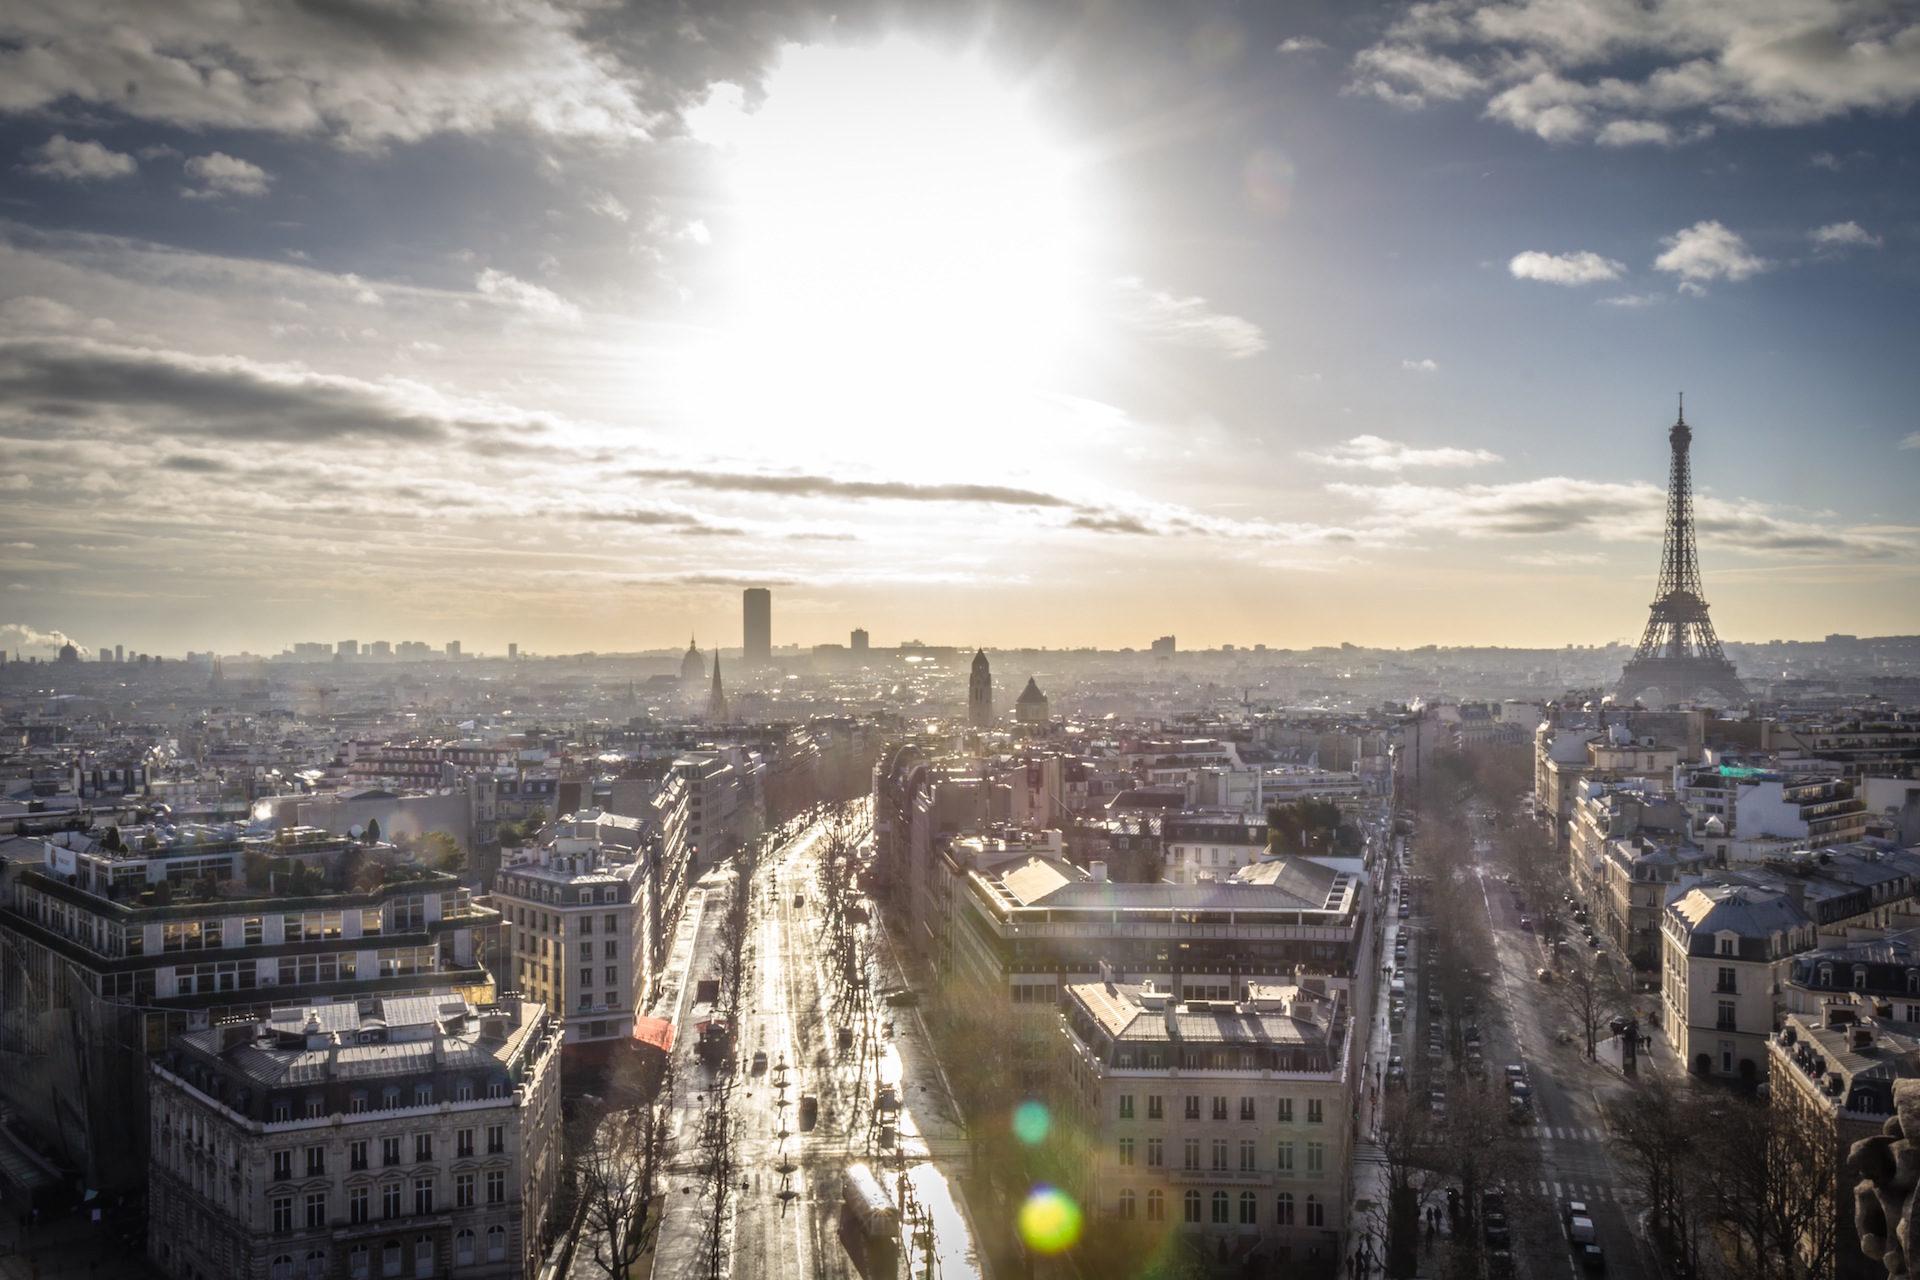 Parigi, Francia, Torre, Eiffel, Sole - Sfondi HD - Professor-falken.com